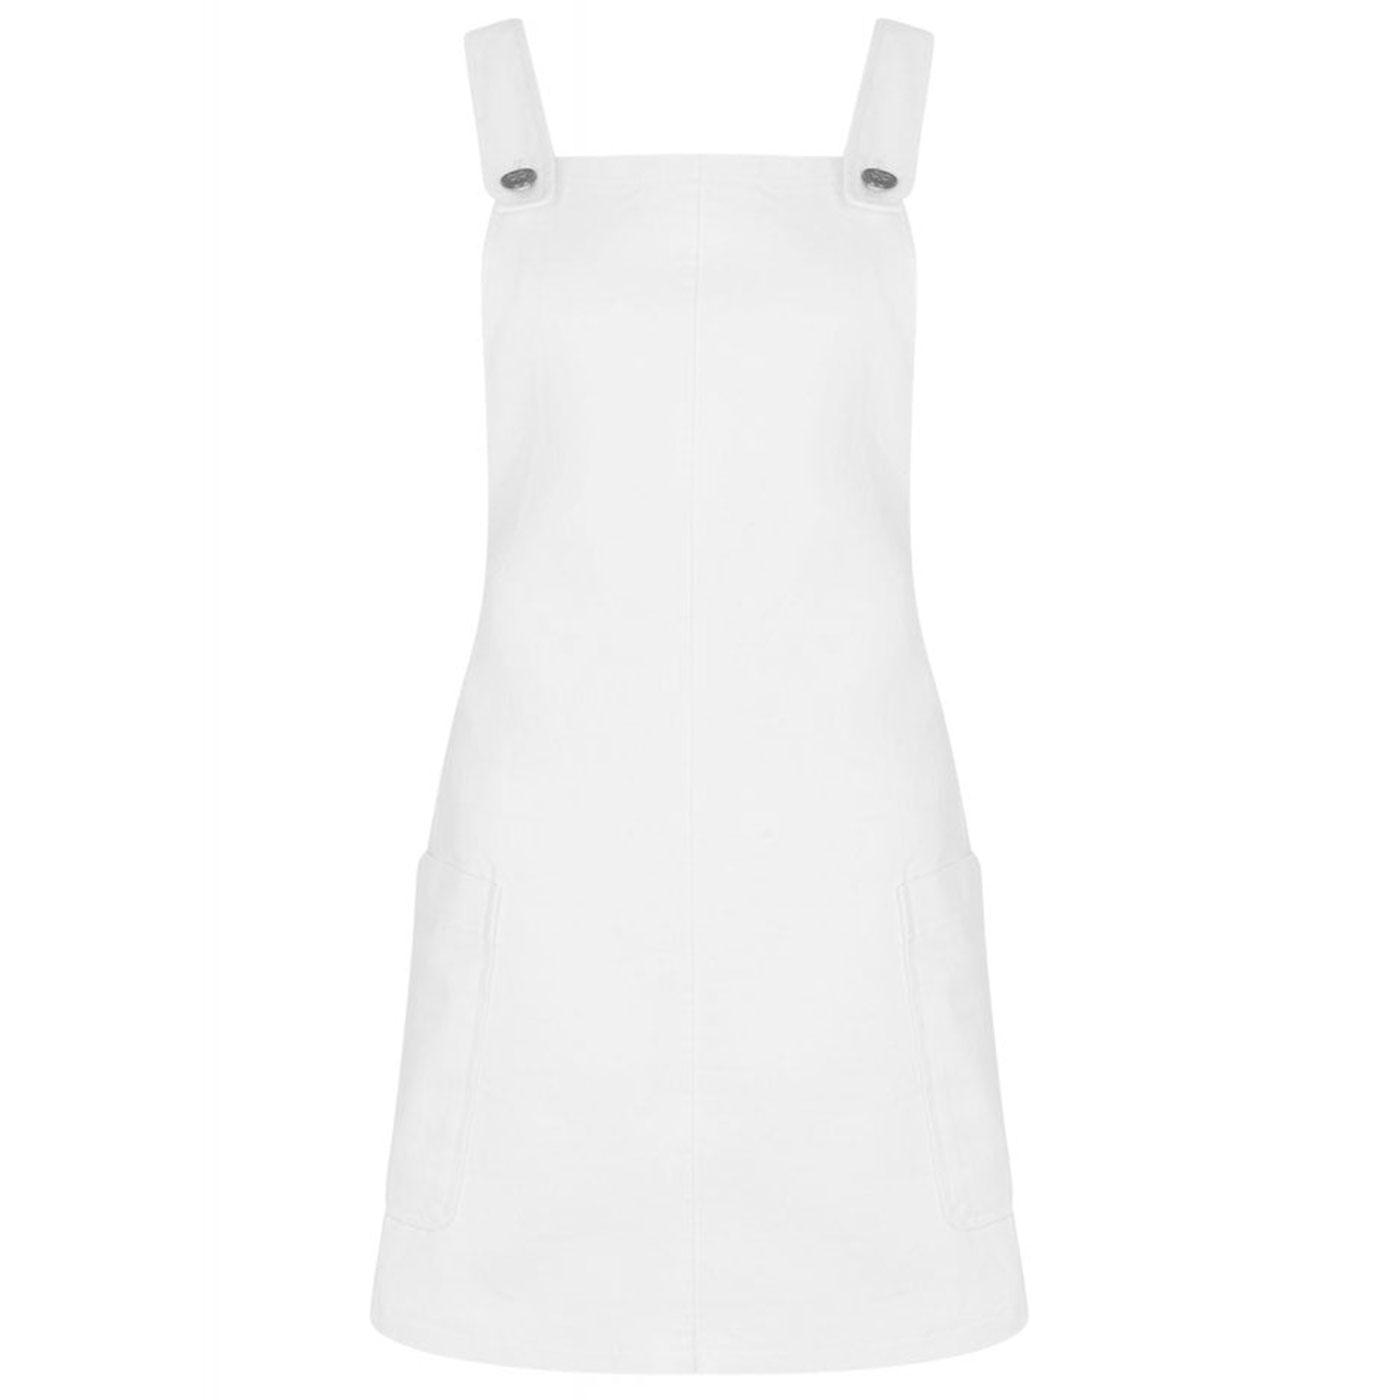 Lena BRIGHT & BEAUTIFUL Retro 60s Pinafore Dress